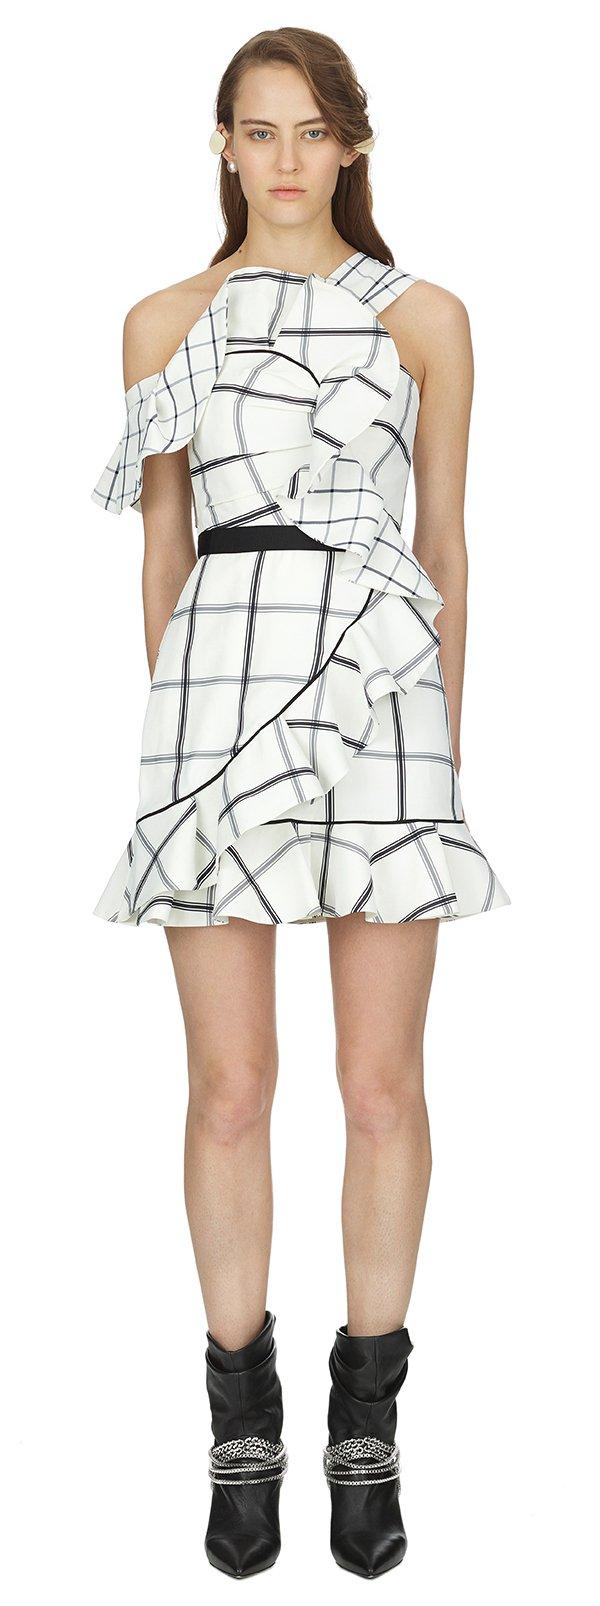 sp18-092s-01- Frill Check Mini Dress.jpg